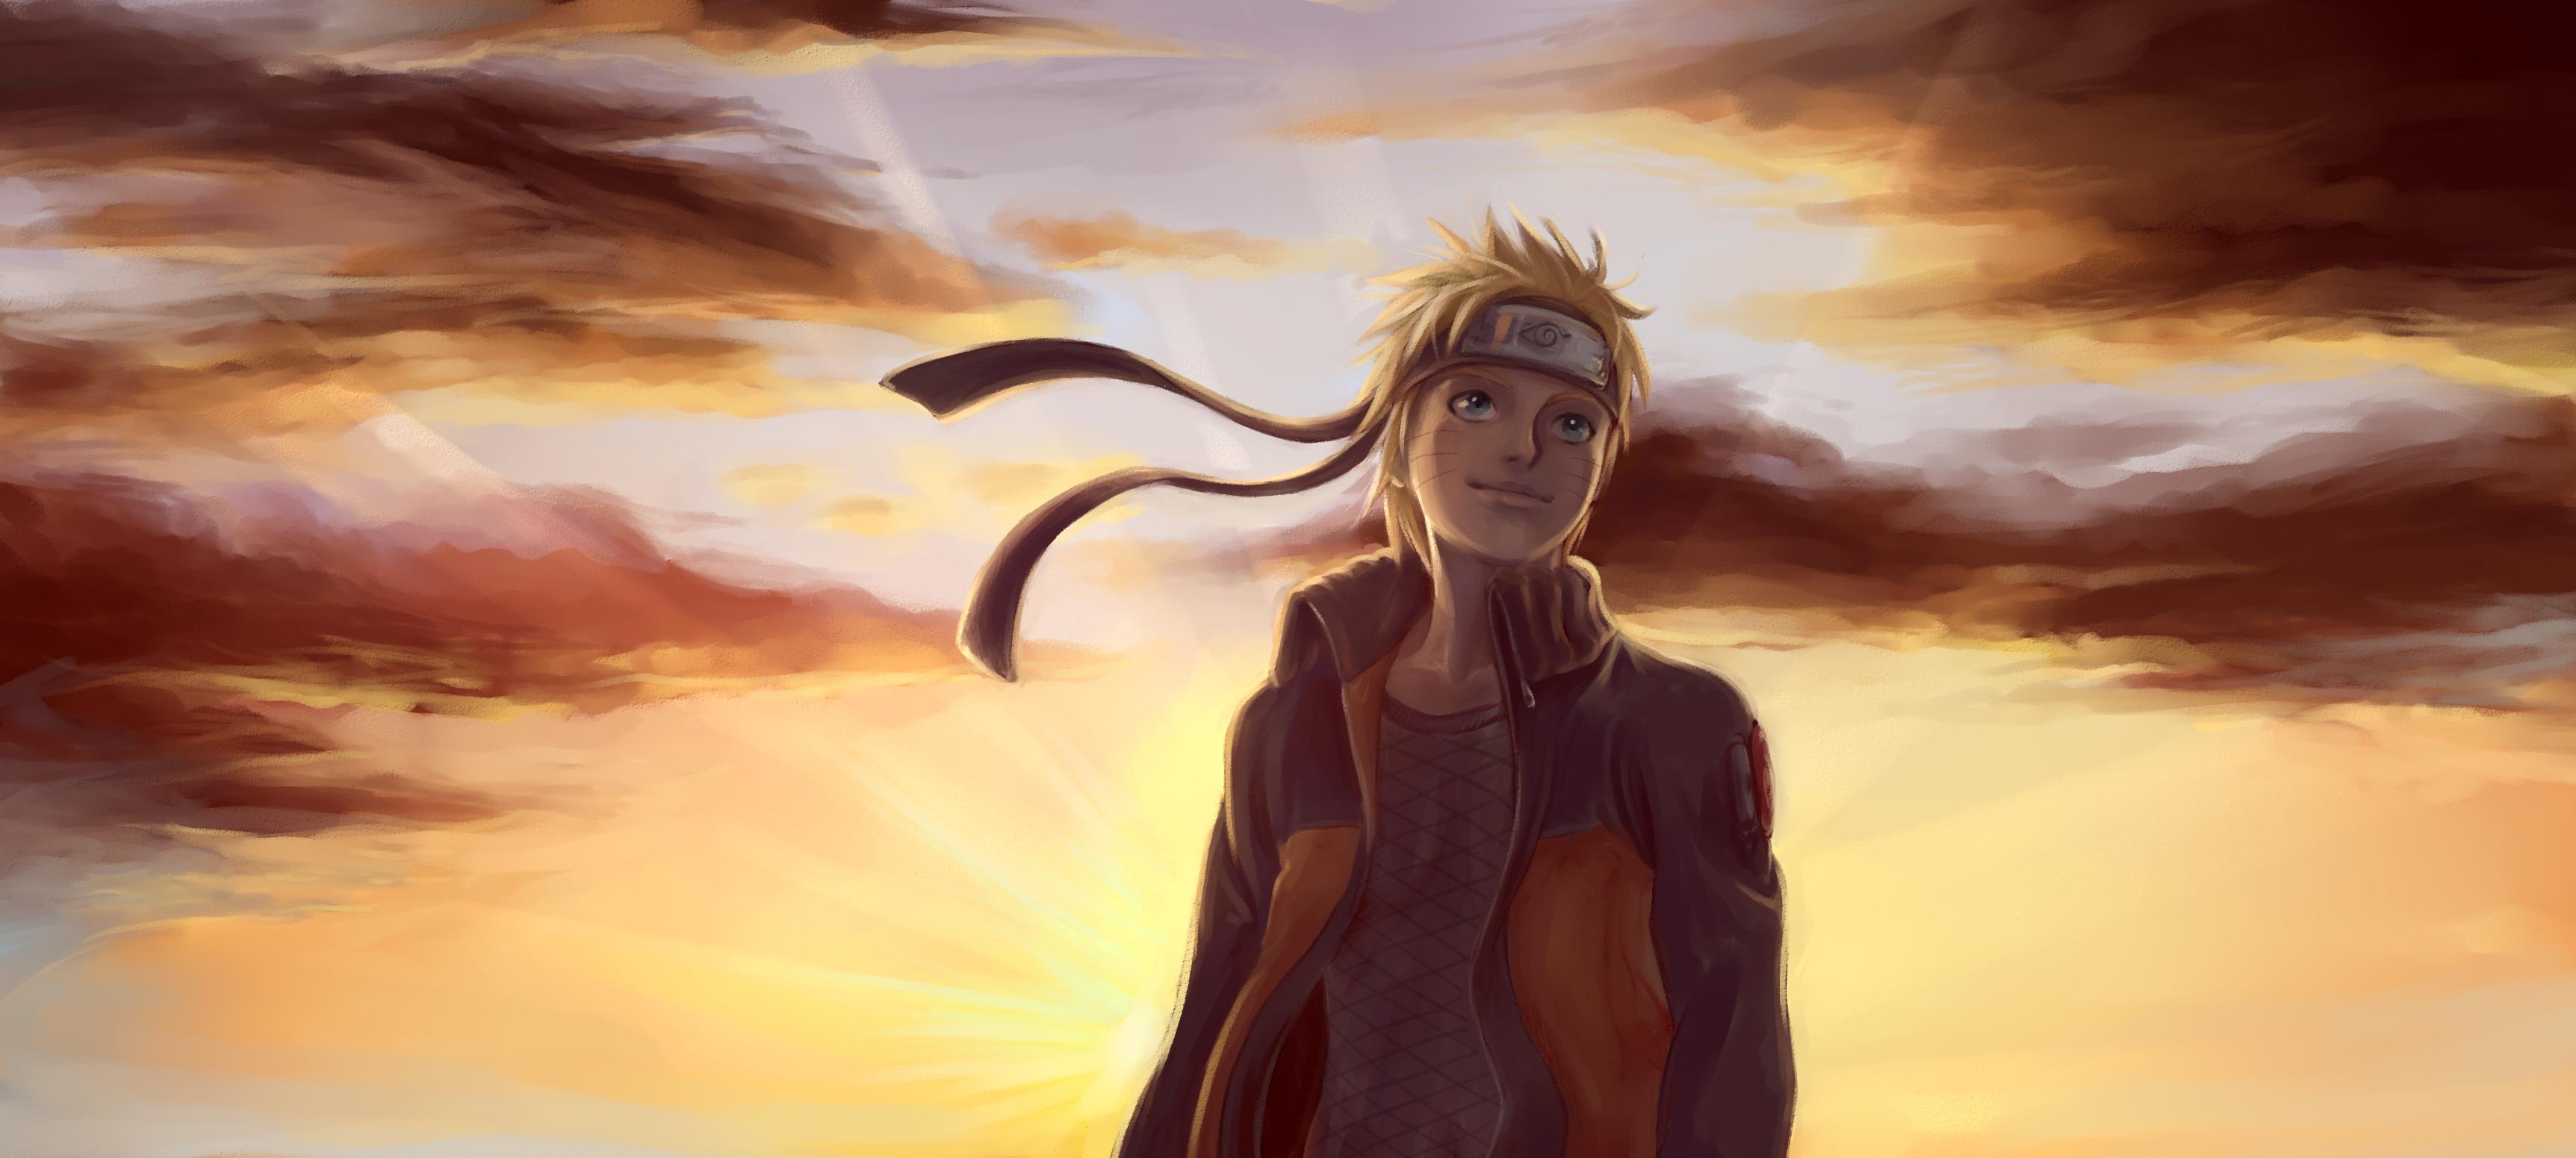 http://static.zerochan.net/Uzumaki.Naruto.full.1760294.jpg